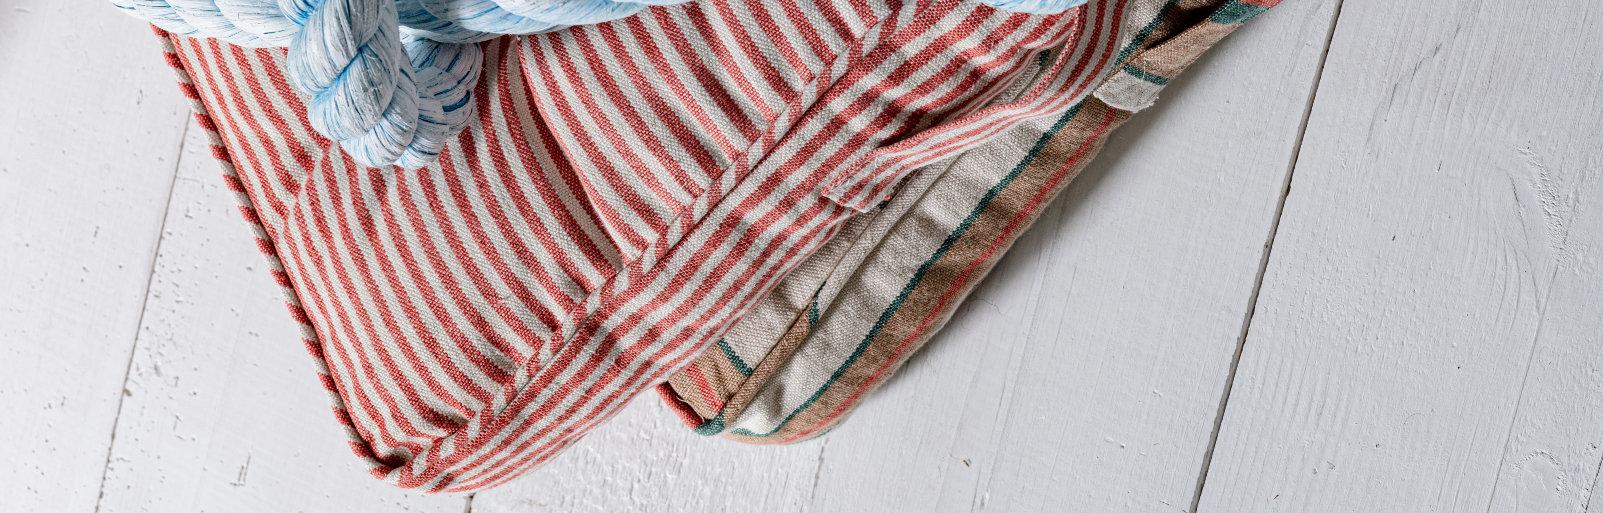 Striped Linens